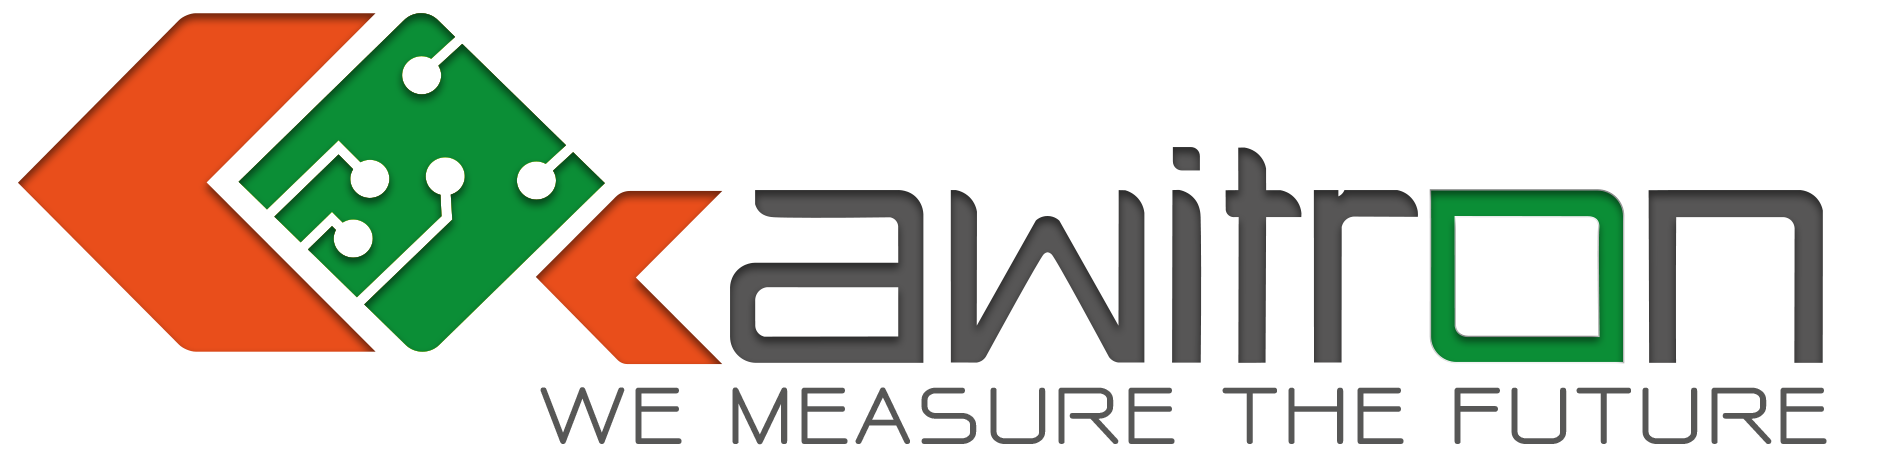 KAWITRON | WE MEASURE THE FUTURE